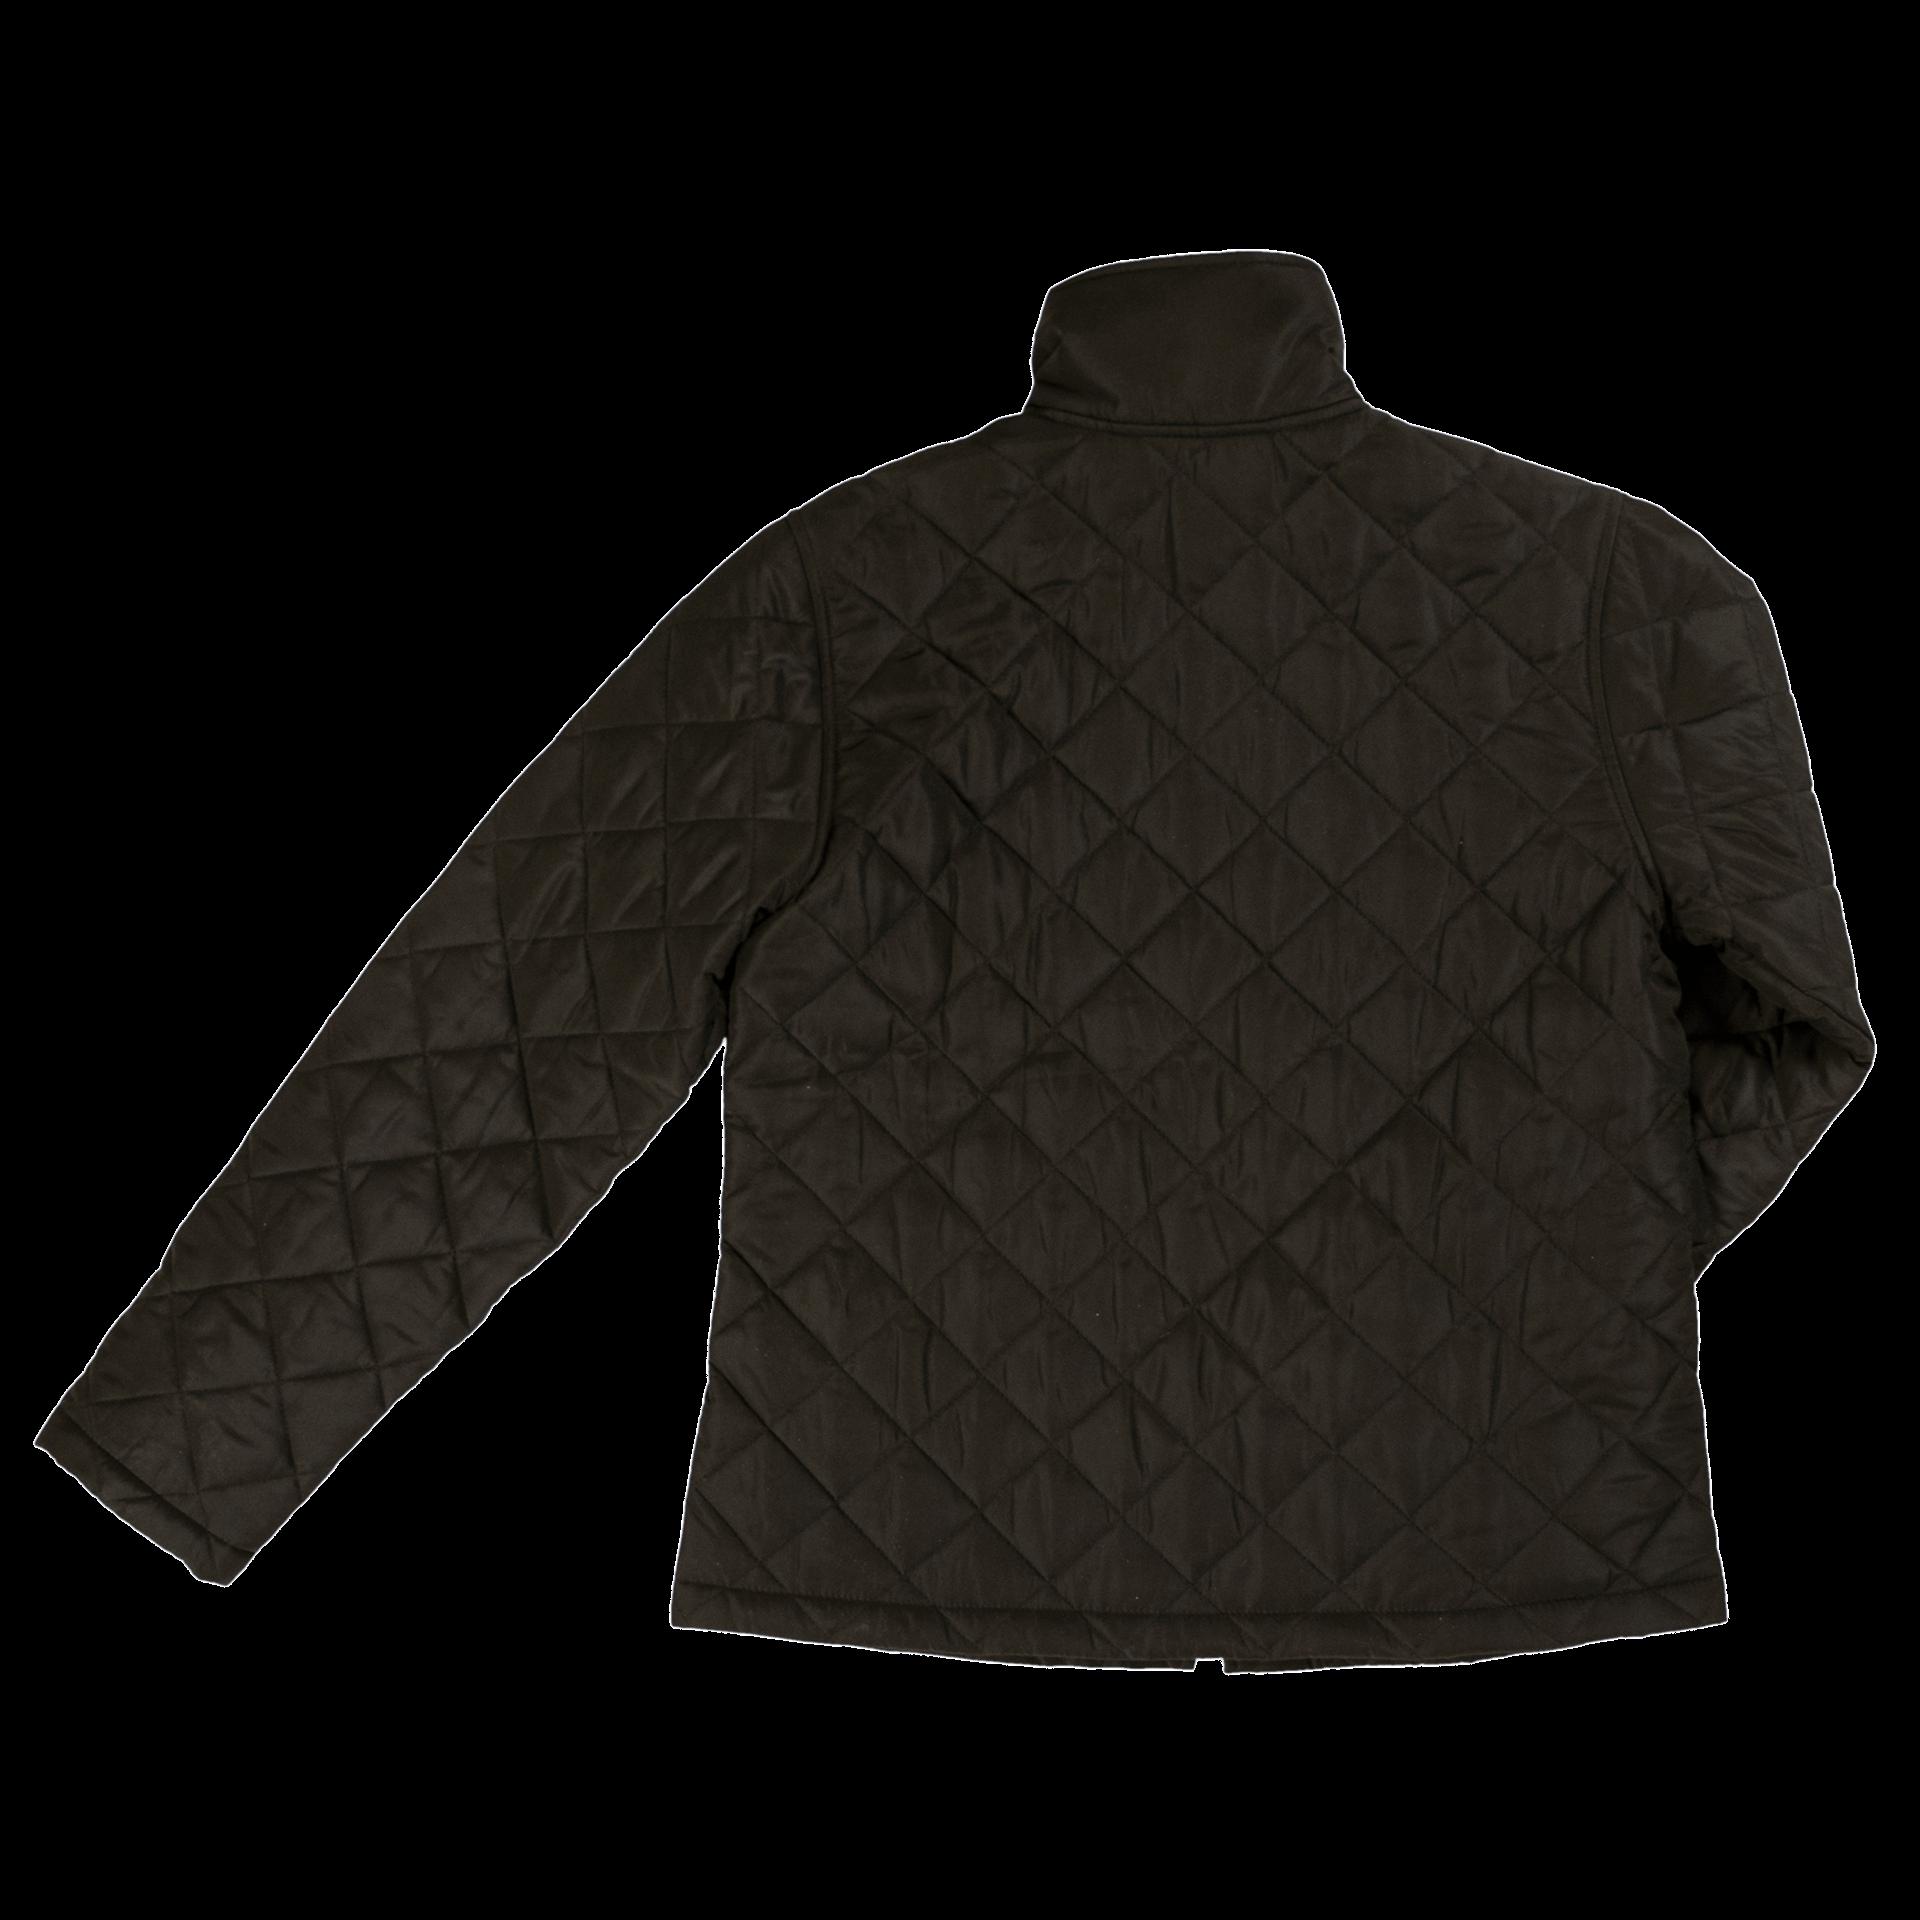 WJ19-BLACK-B-Tough-Duck-Womens-Quilted-Freezer-Jacket-Black-Back